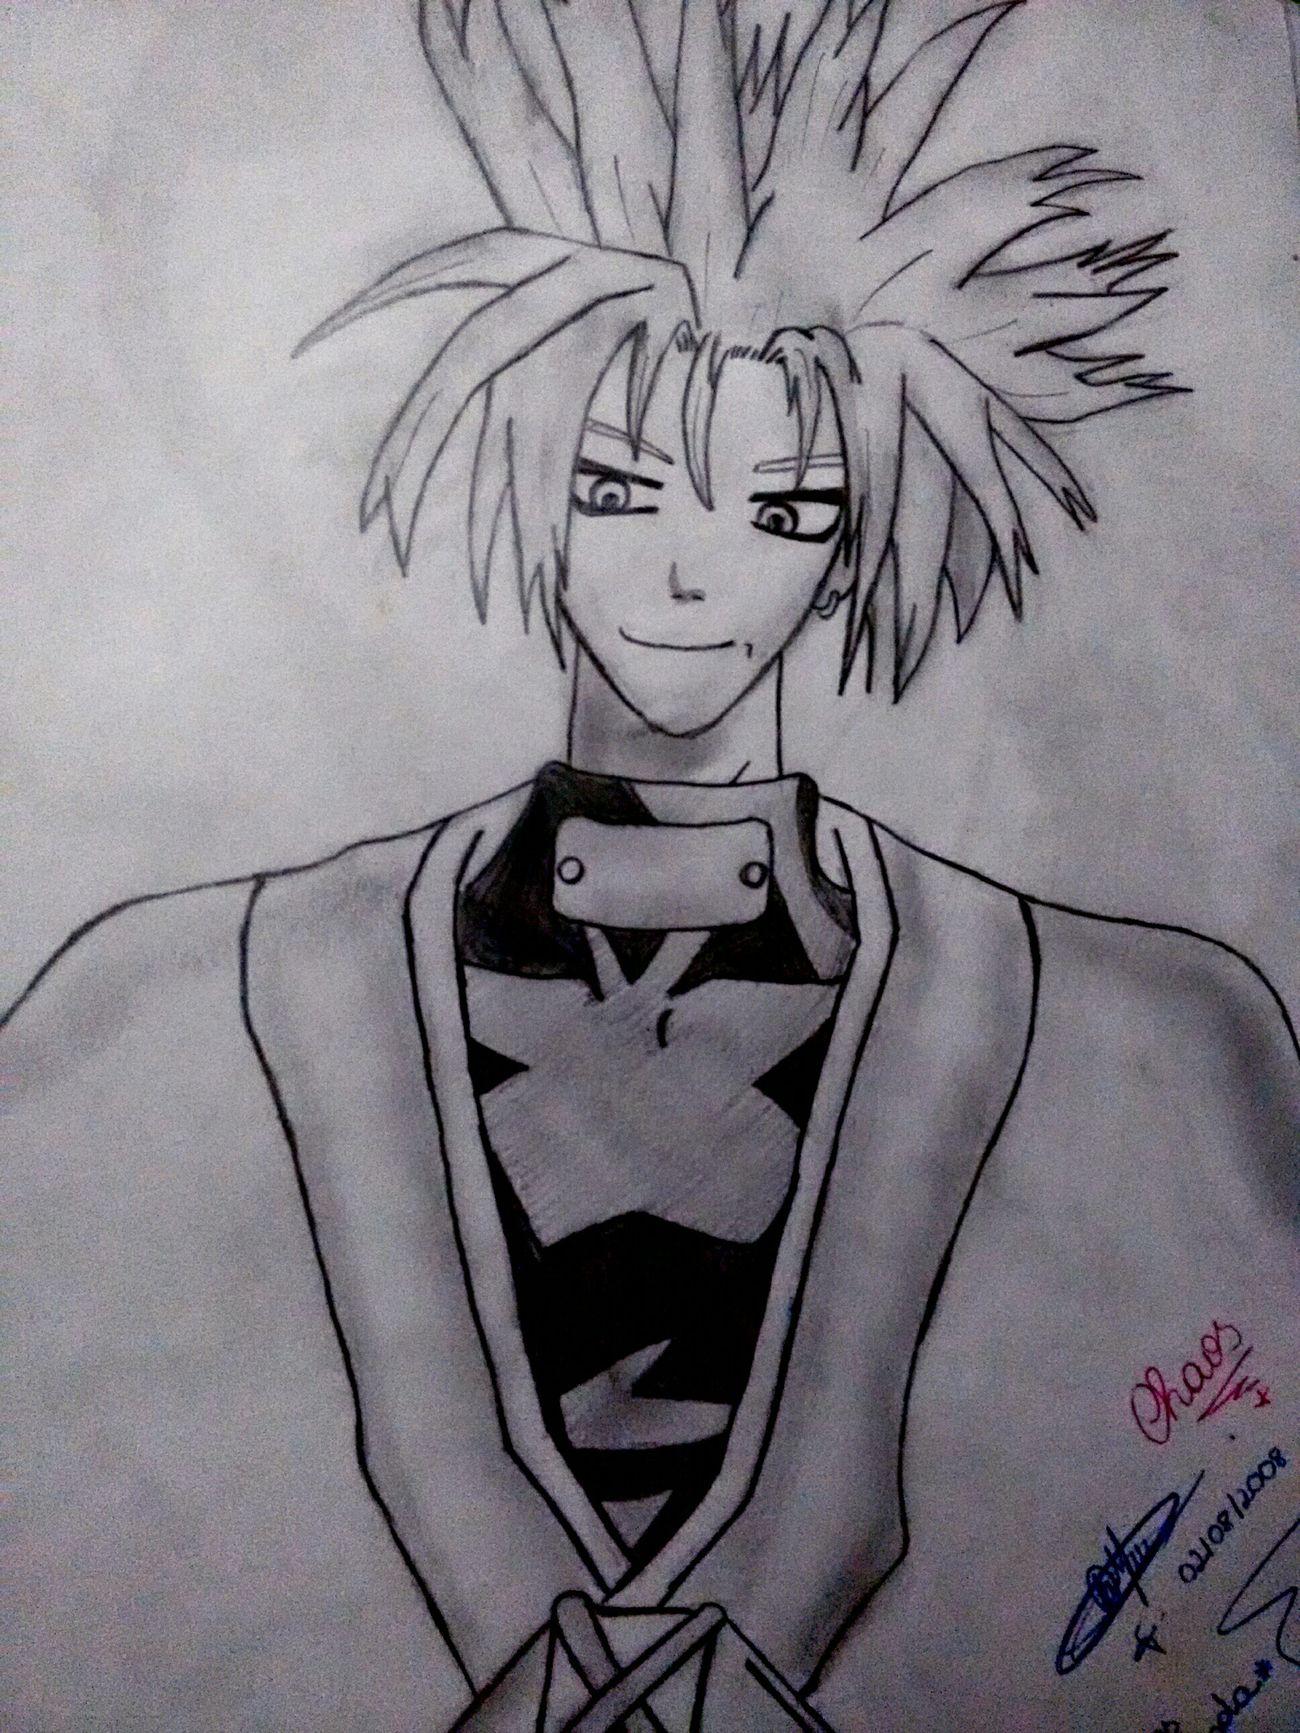 Drawing Black & White Dibujo Anime Art Artistic LM_colection Ragnarok Desenho Graphite